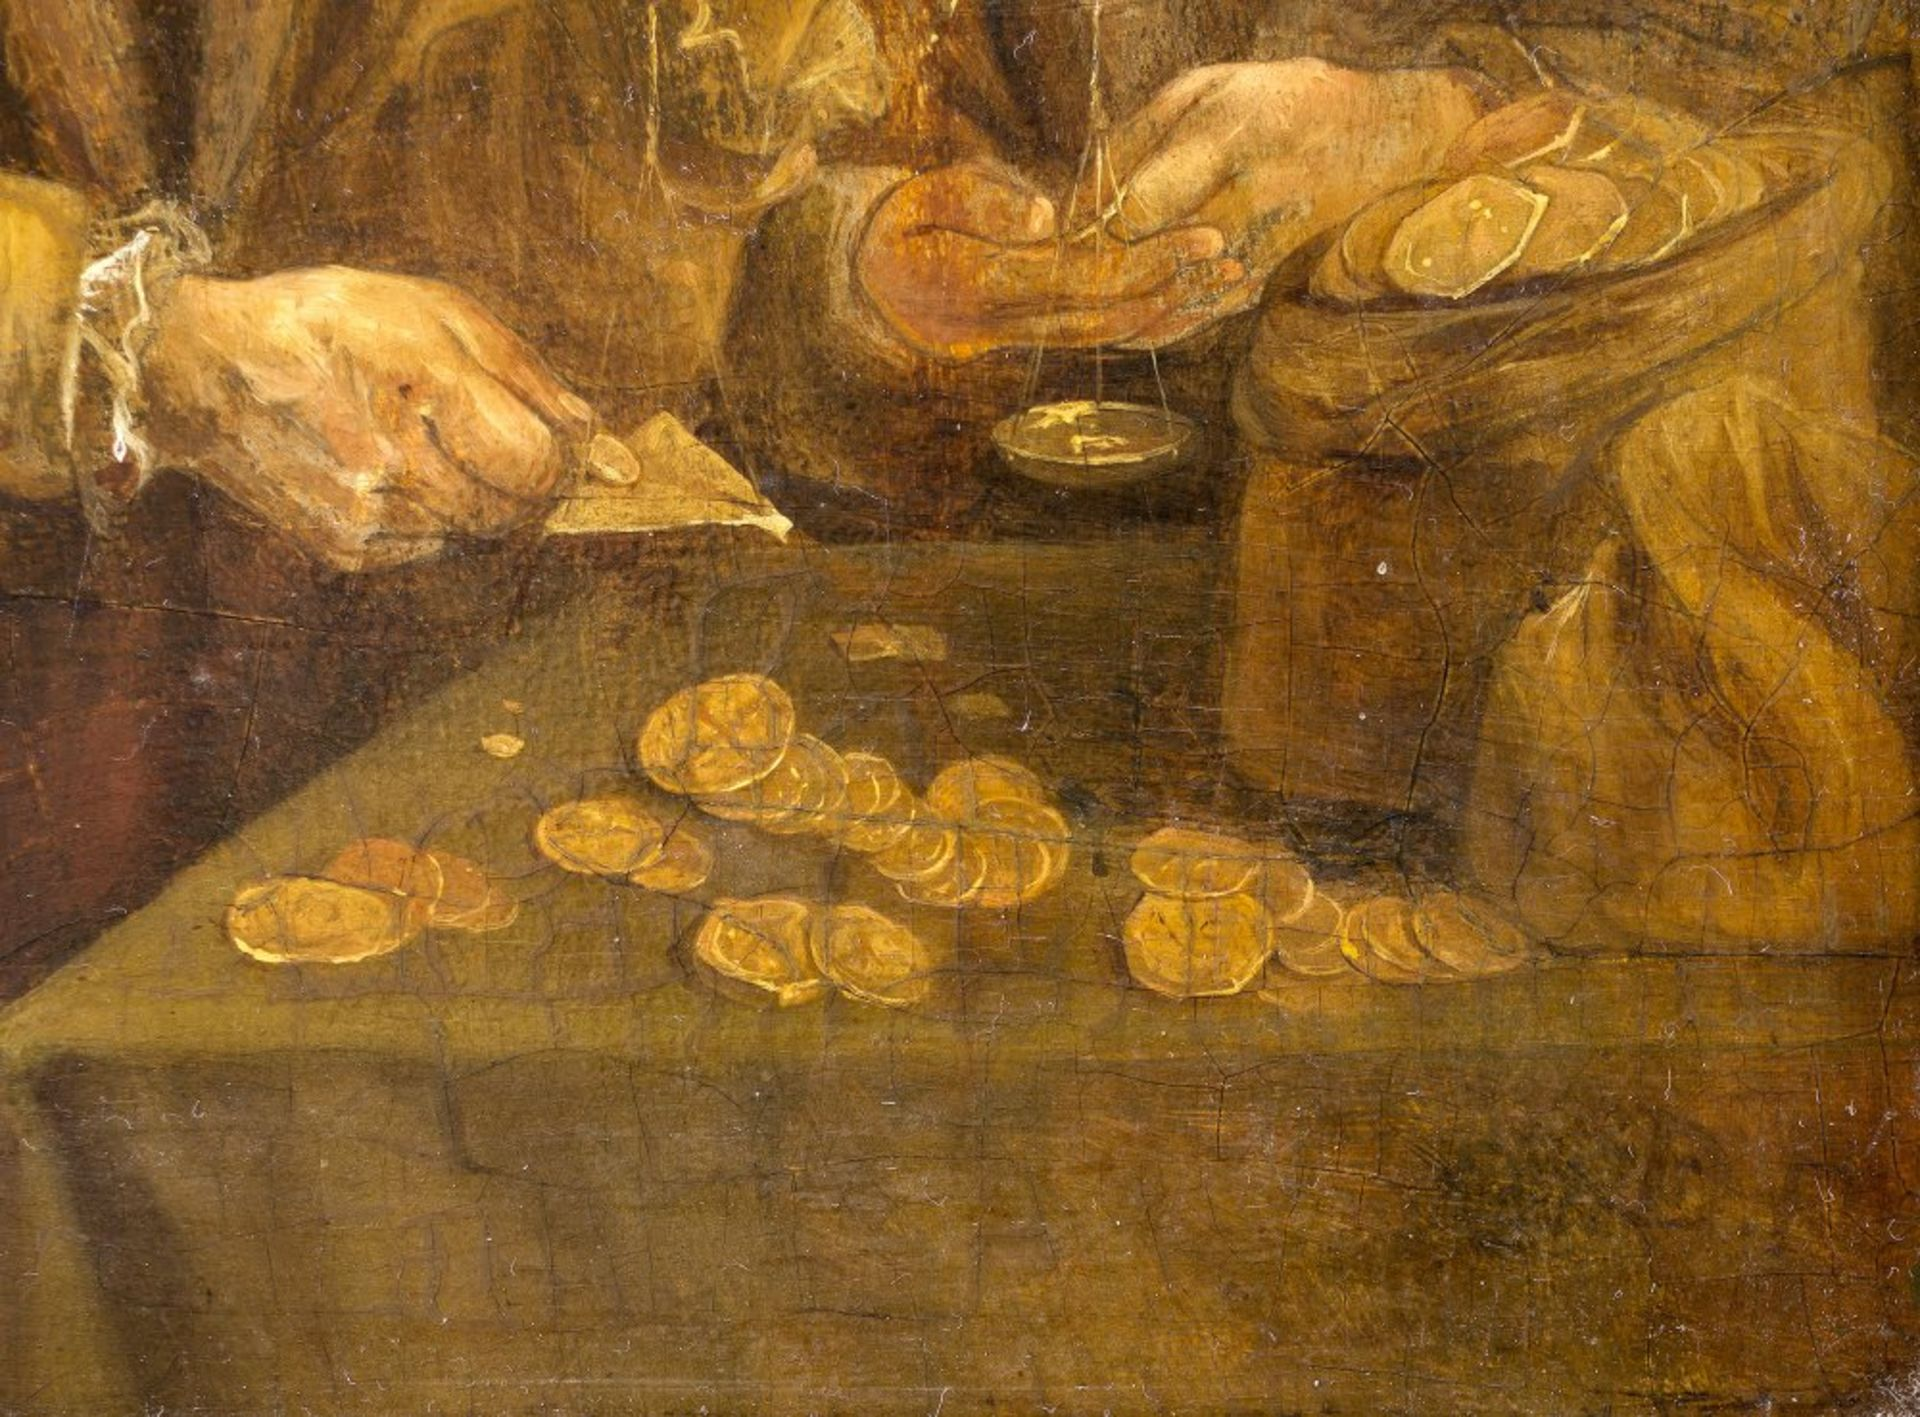 Niederlande, 17. Jh.Der Goldwäger. Öl/Holz. 23,5 x 17,5 cm. Besch., rest. Unsign.The Netherlands , - Bild 2 aus 2